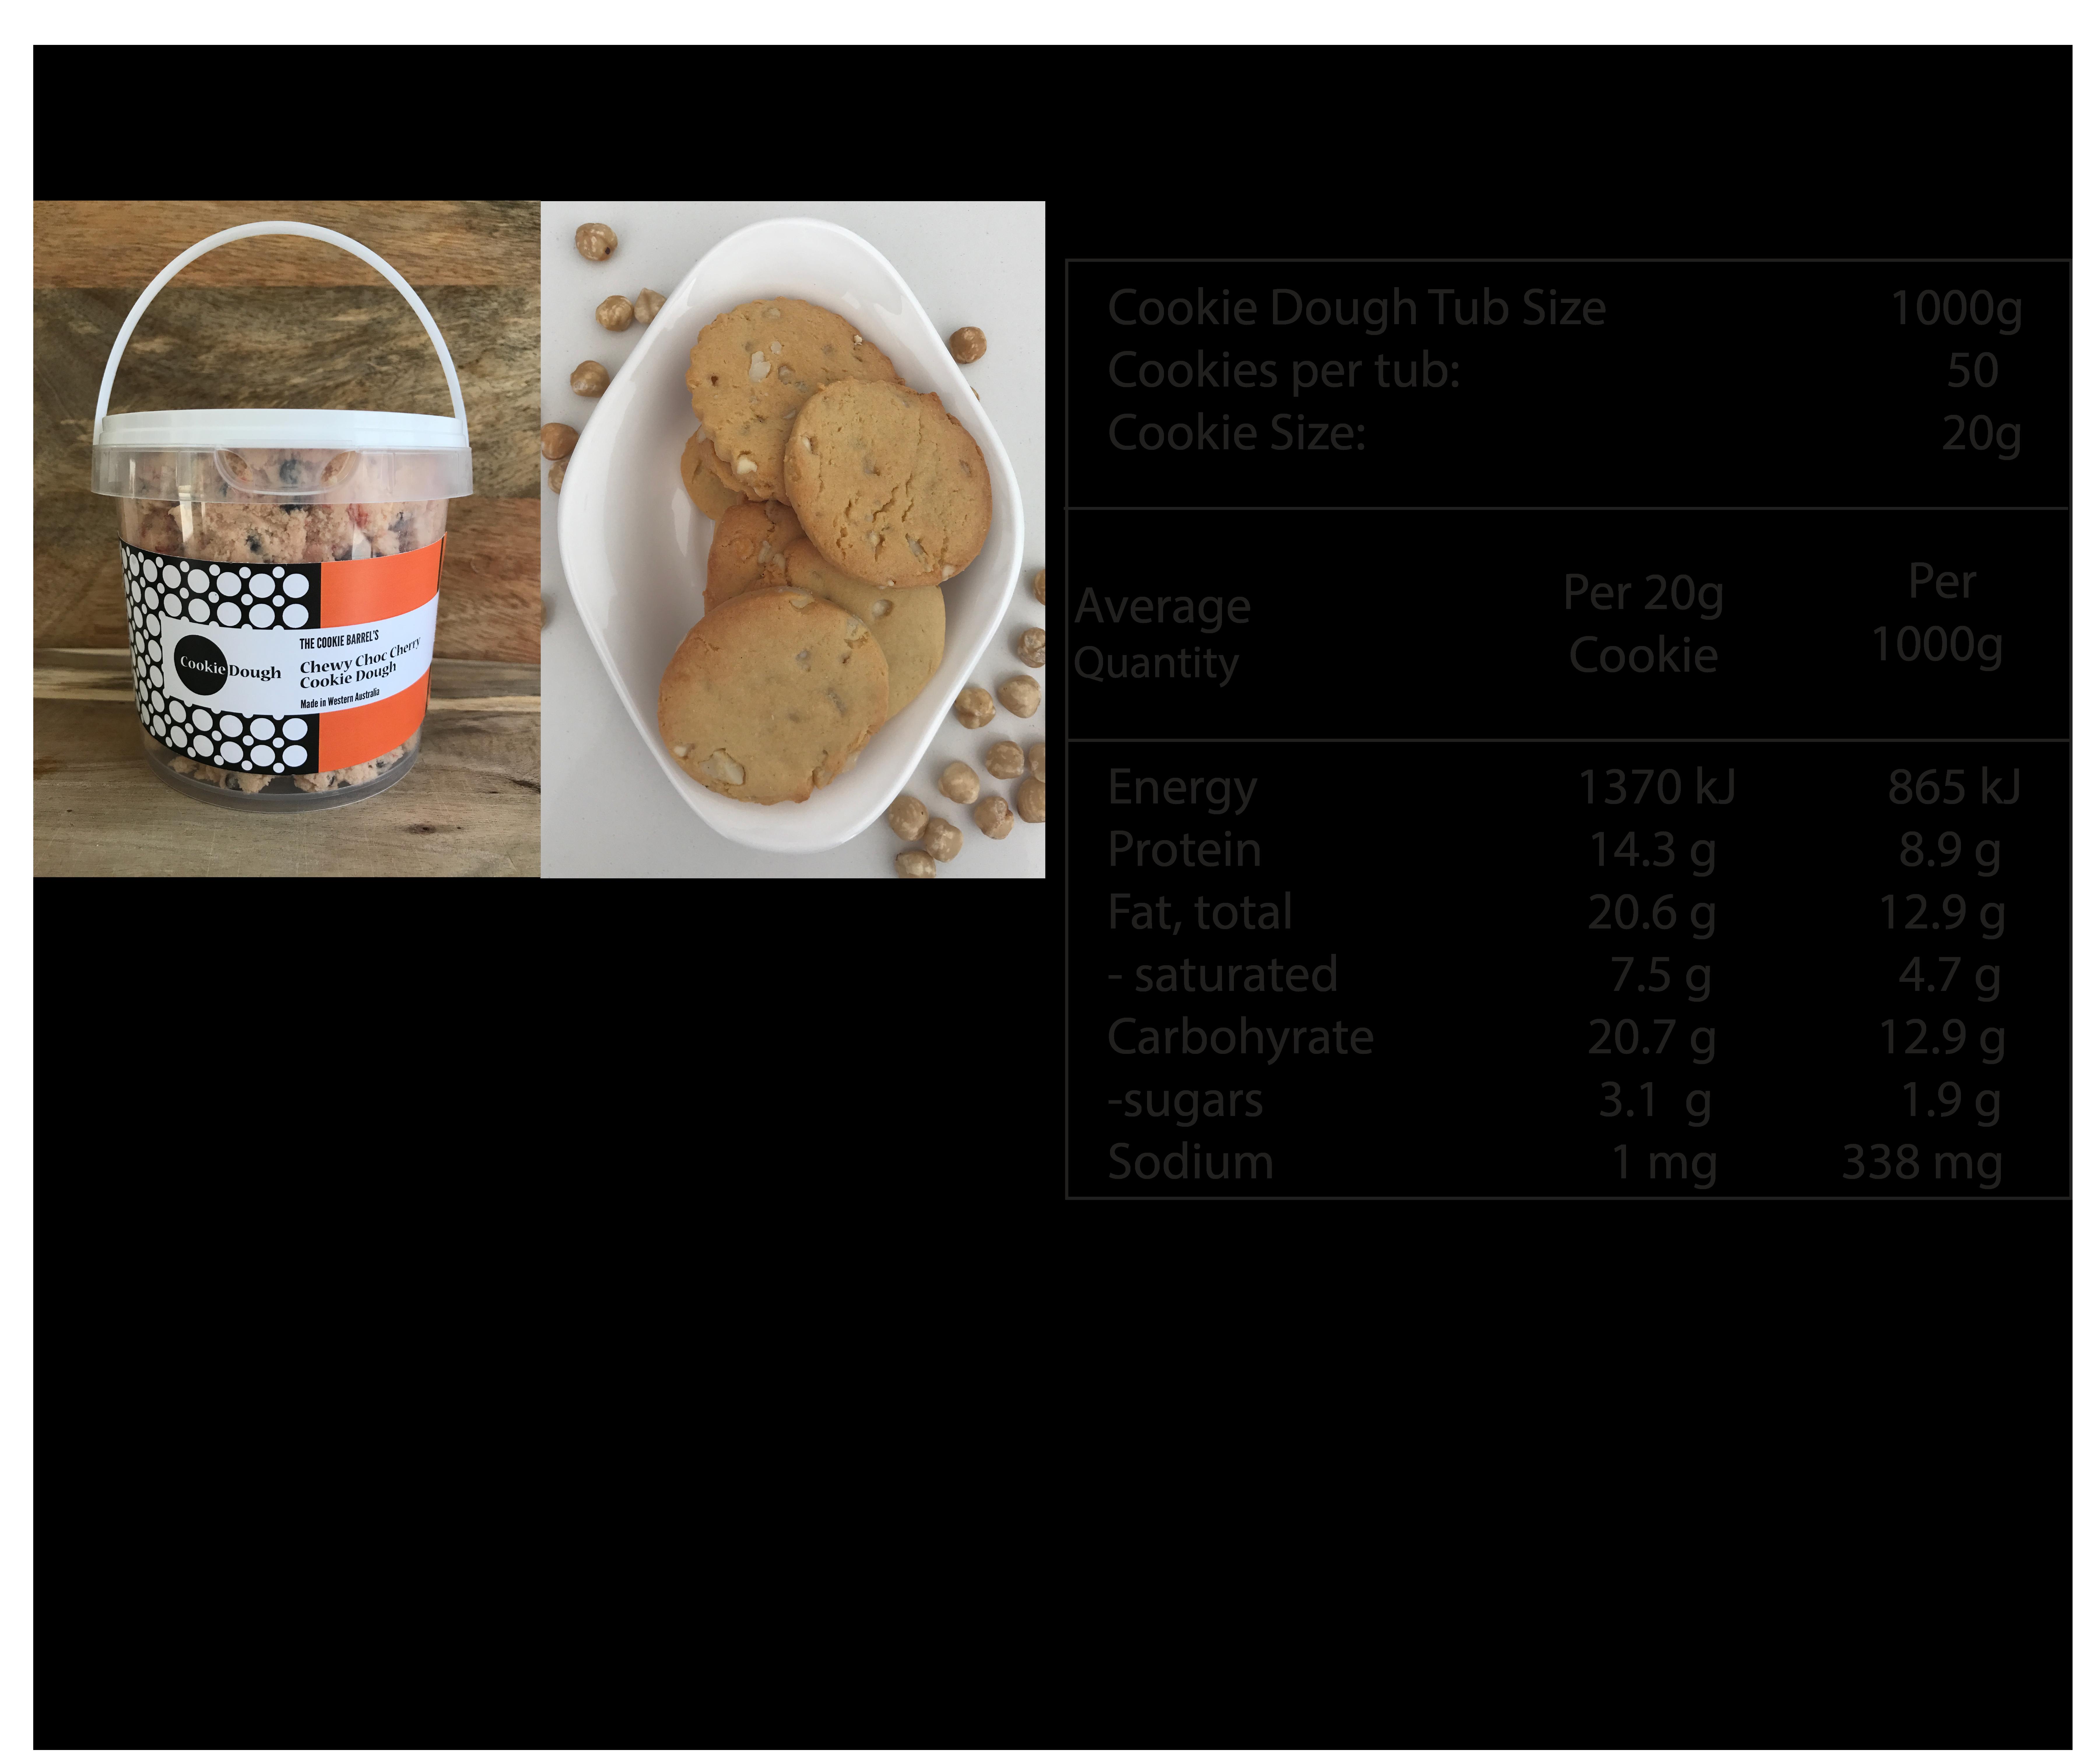 Macadamia & White Choc GF Nutritional Info